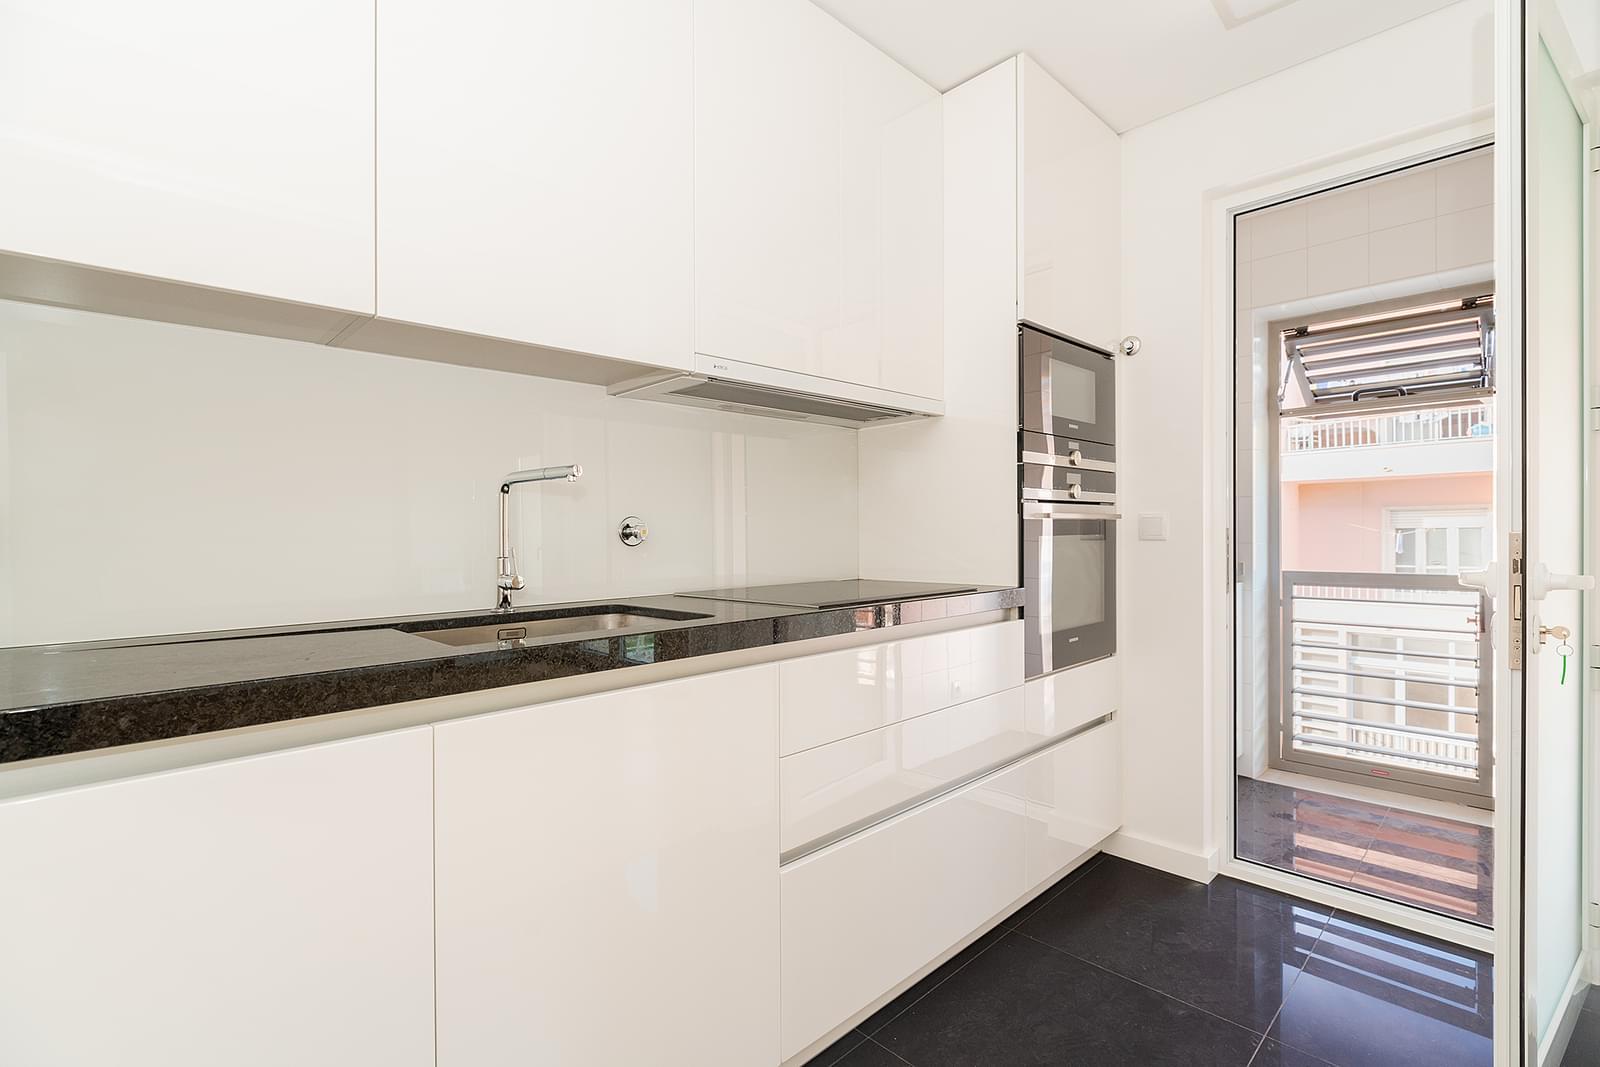 pf18846-apartamento-t2-lisboa-ff5f2b36-59b7-4b63-a074-800d22a08266